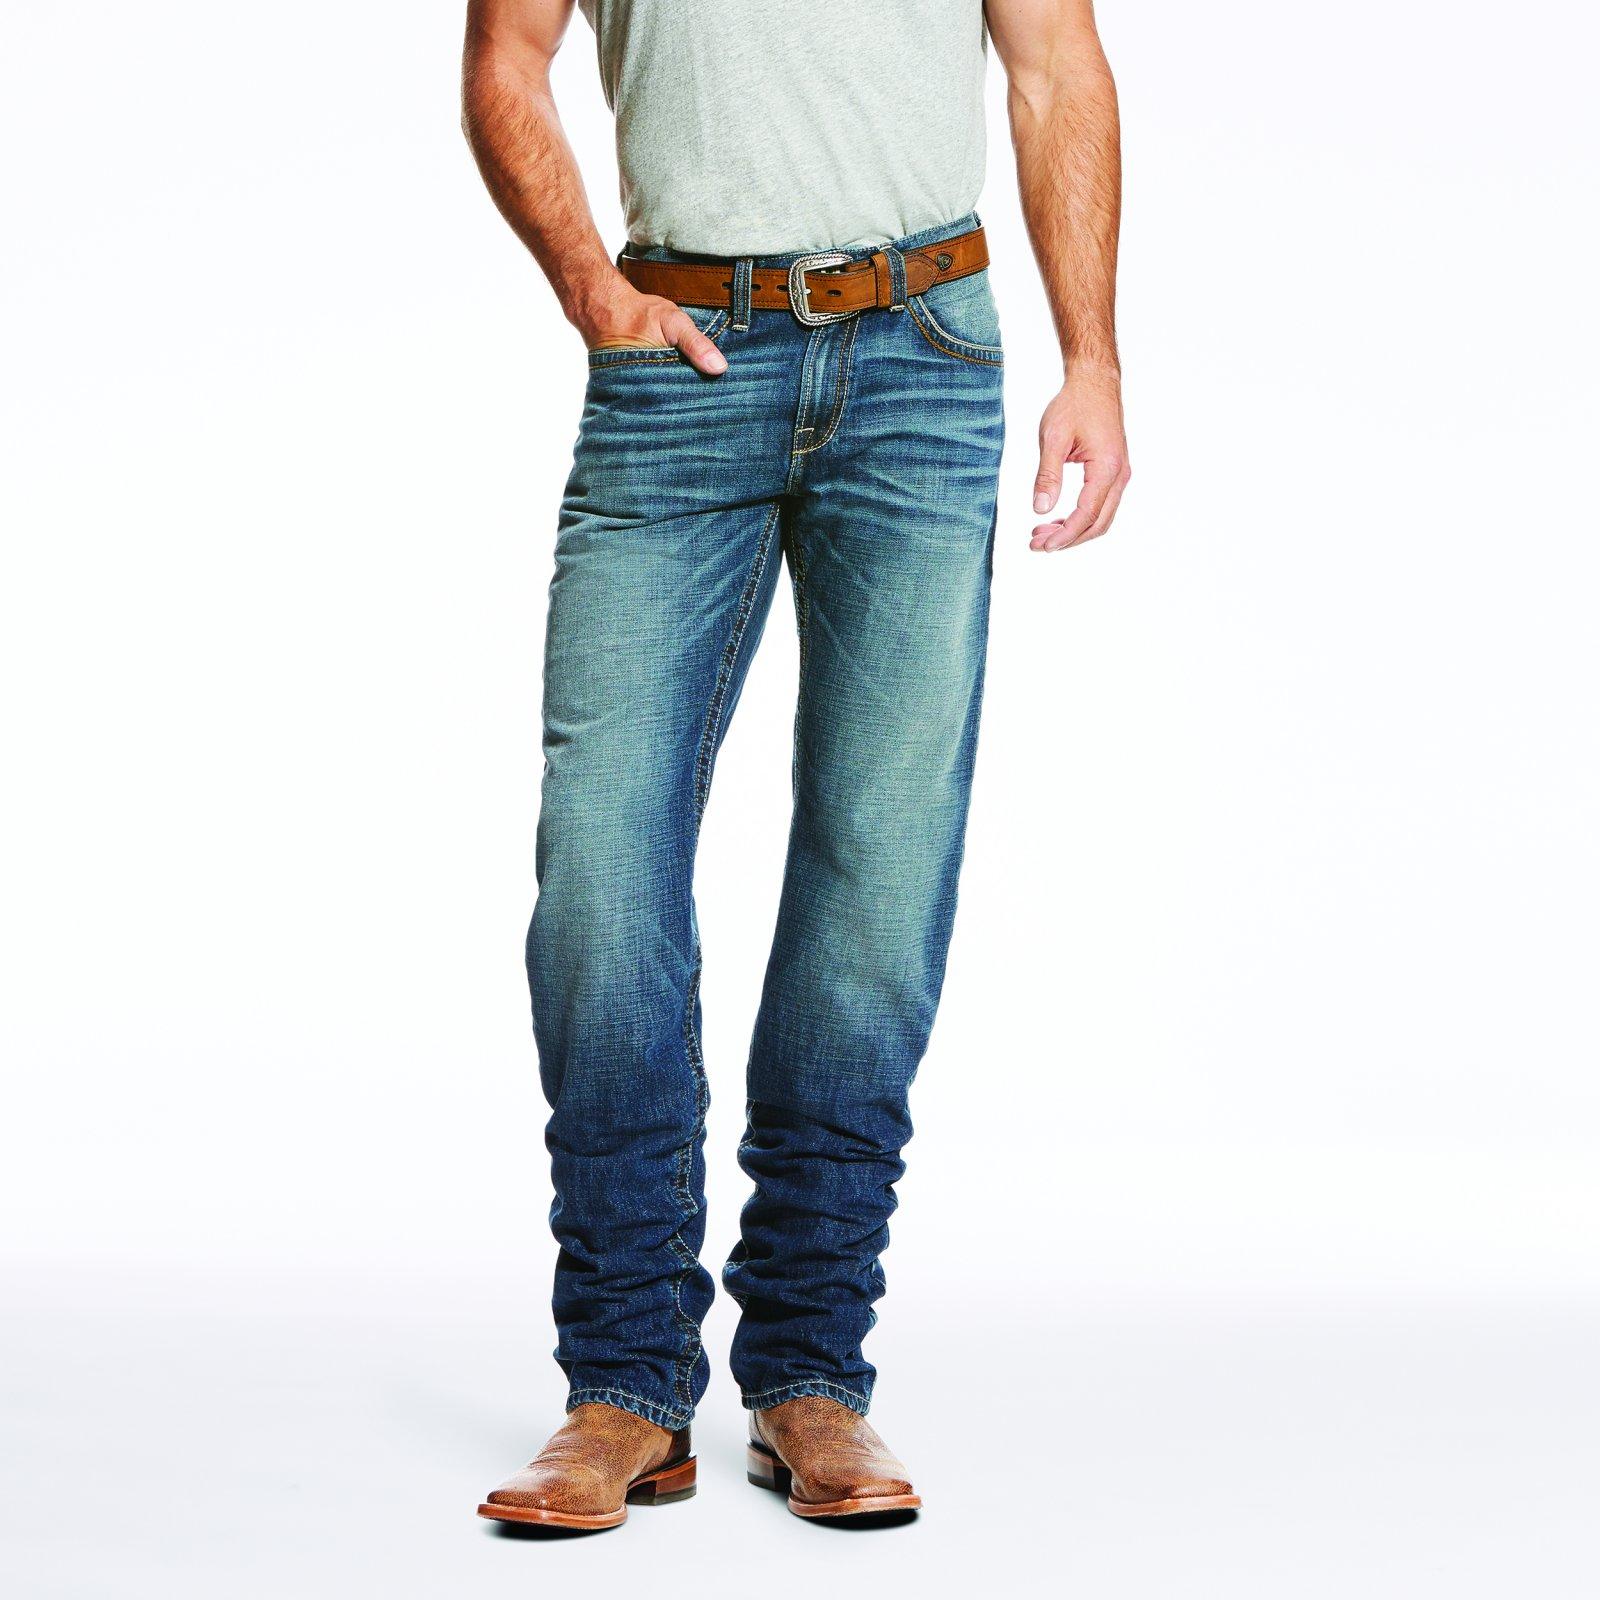 Men's M2 Burke Jean from Ariat